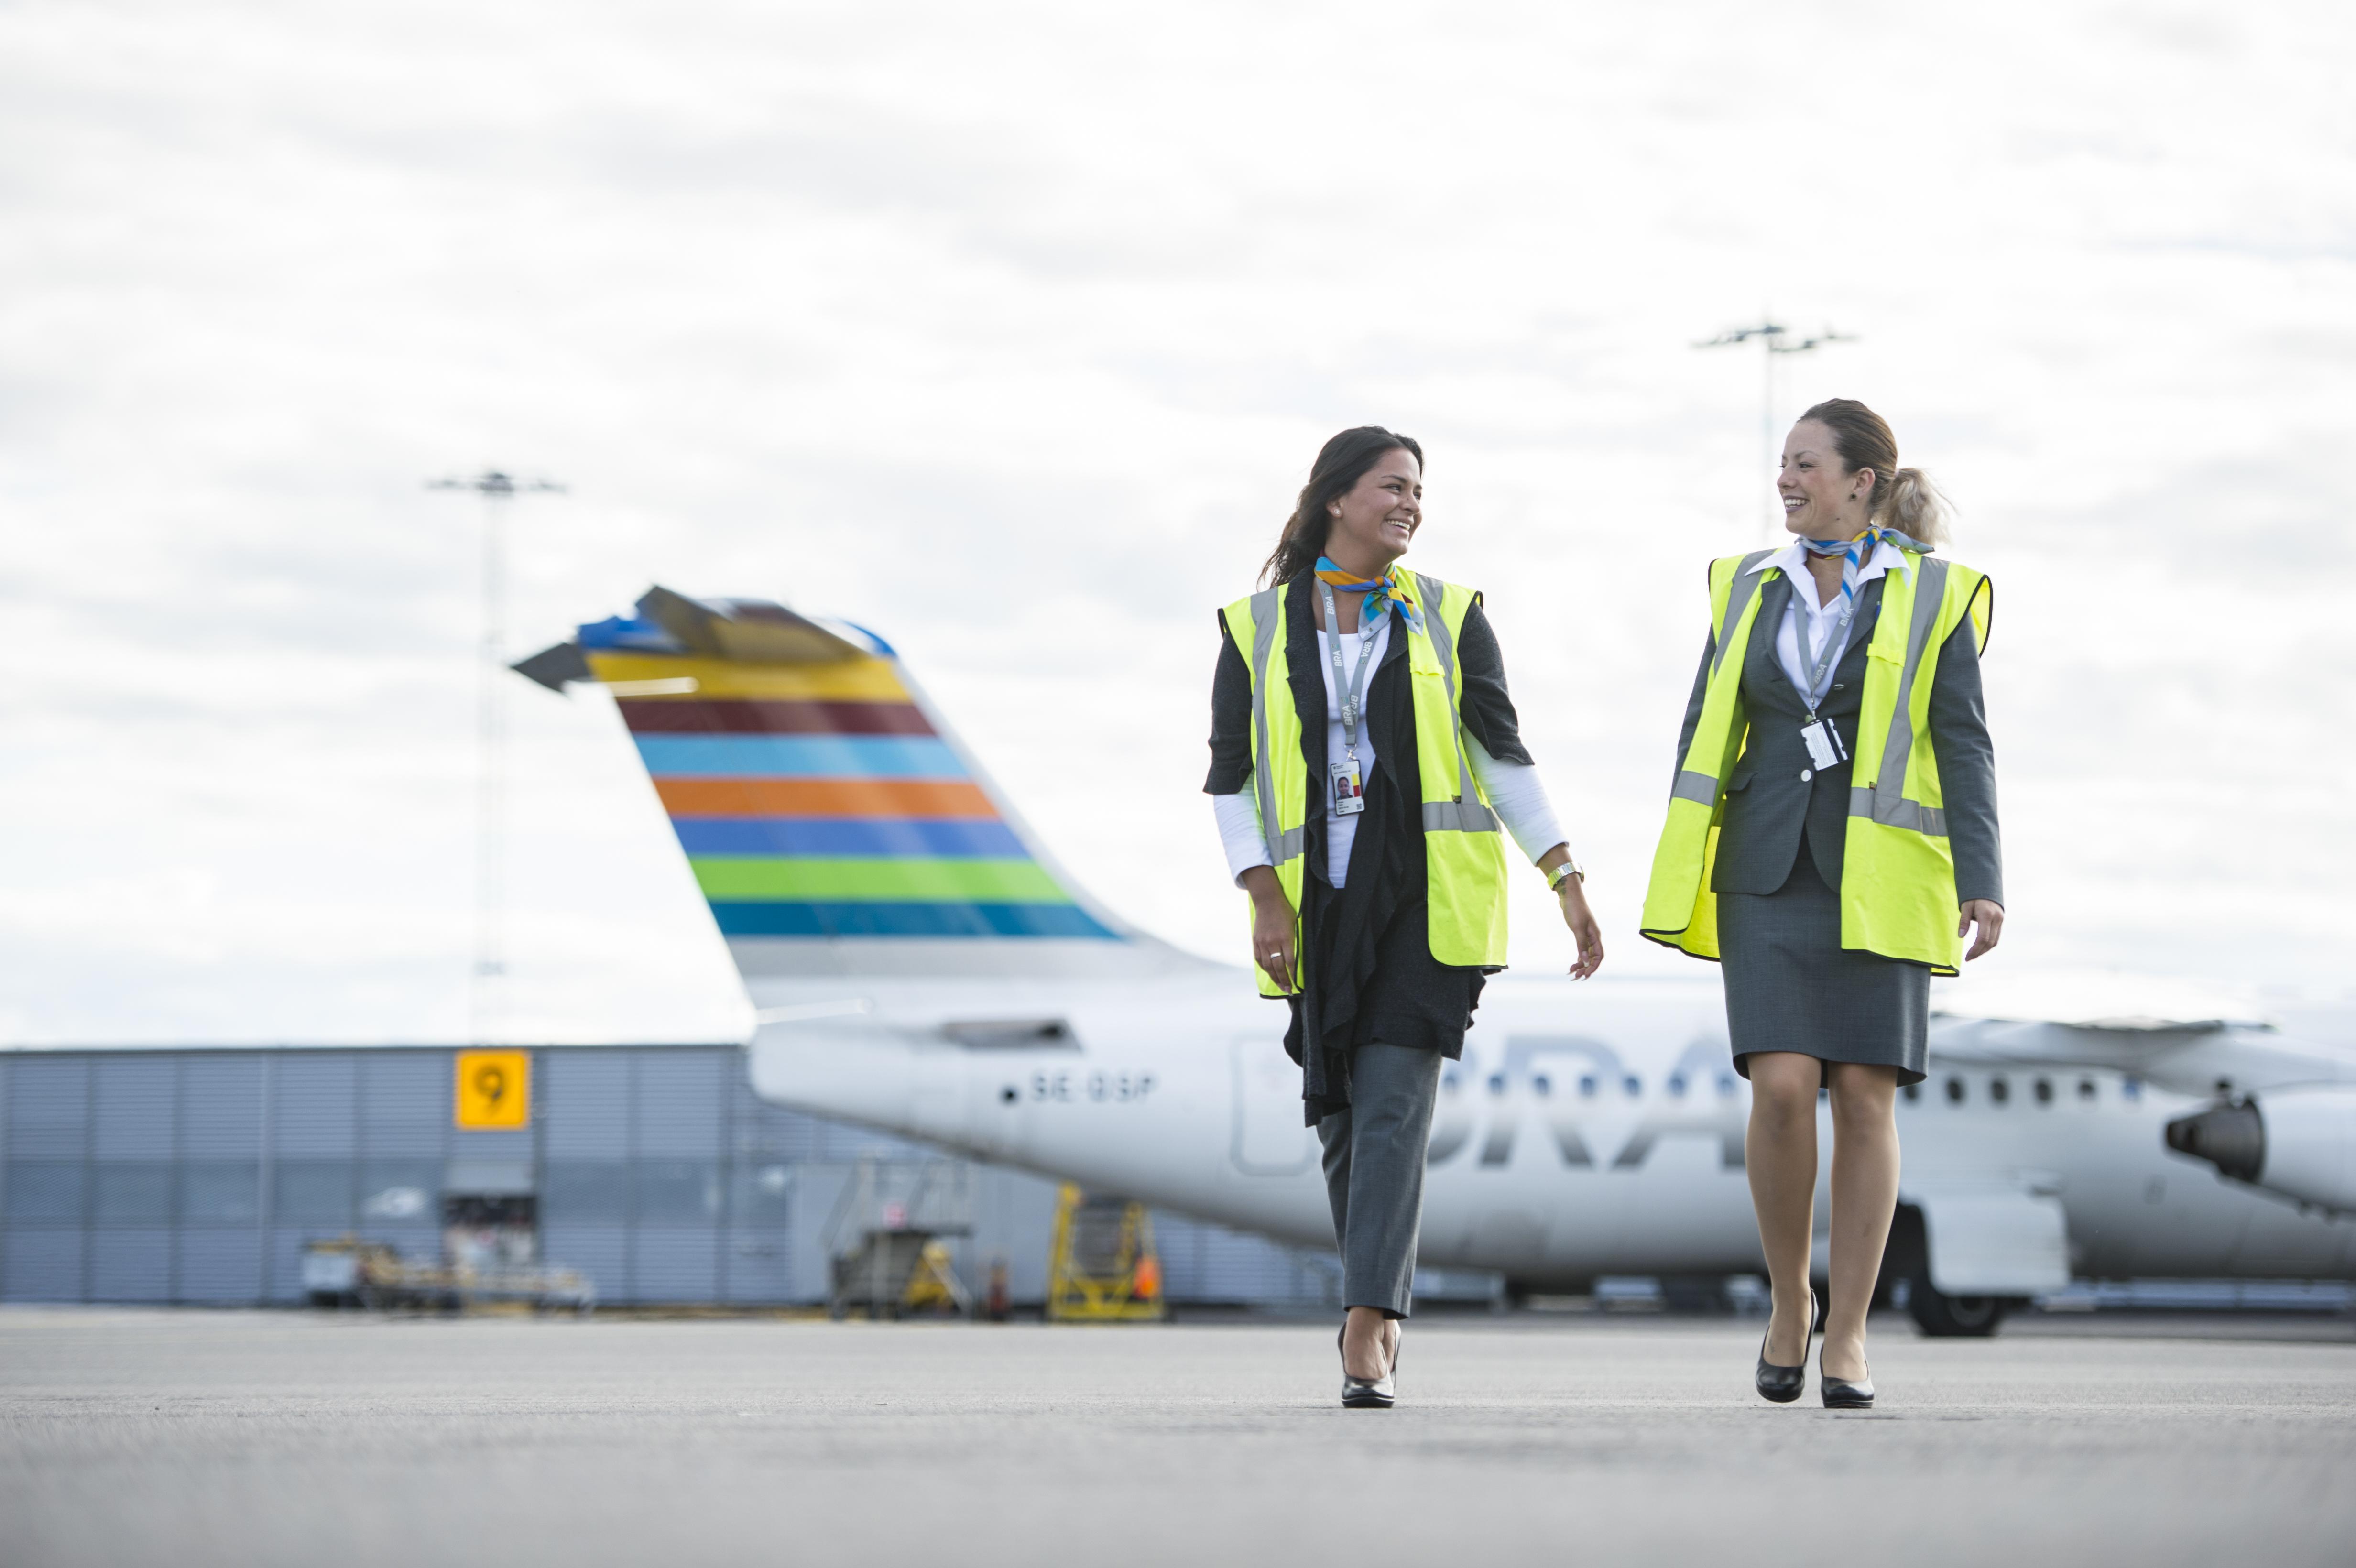 direktflyg umeå visby 2018